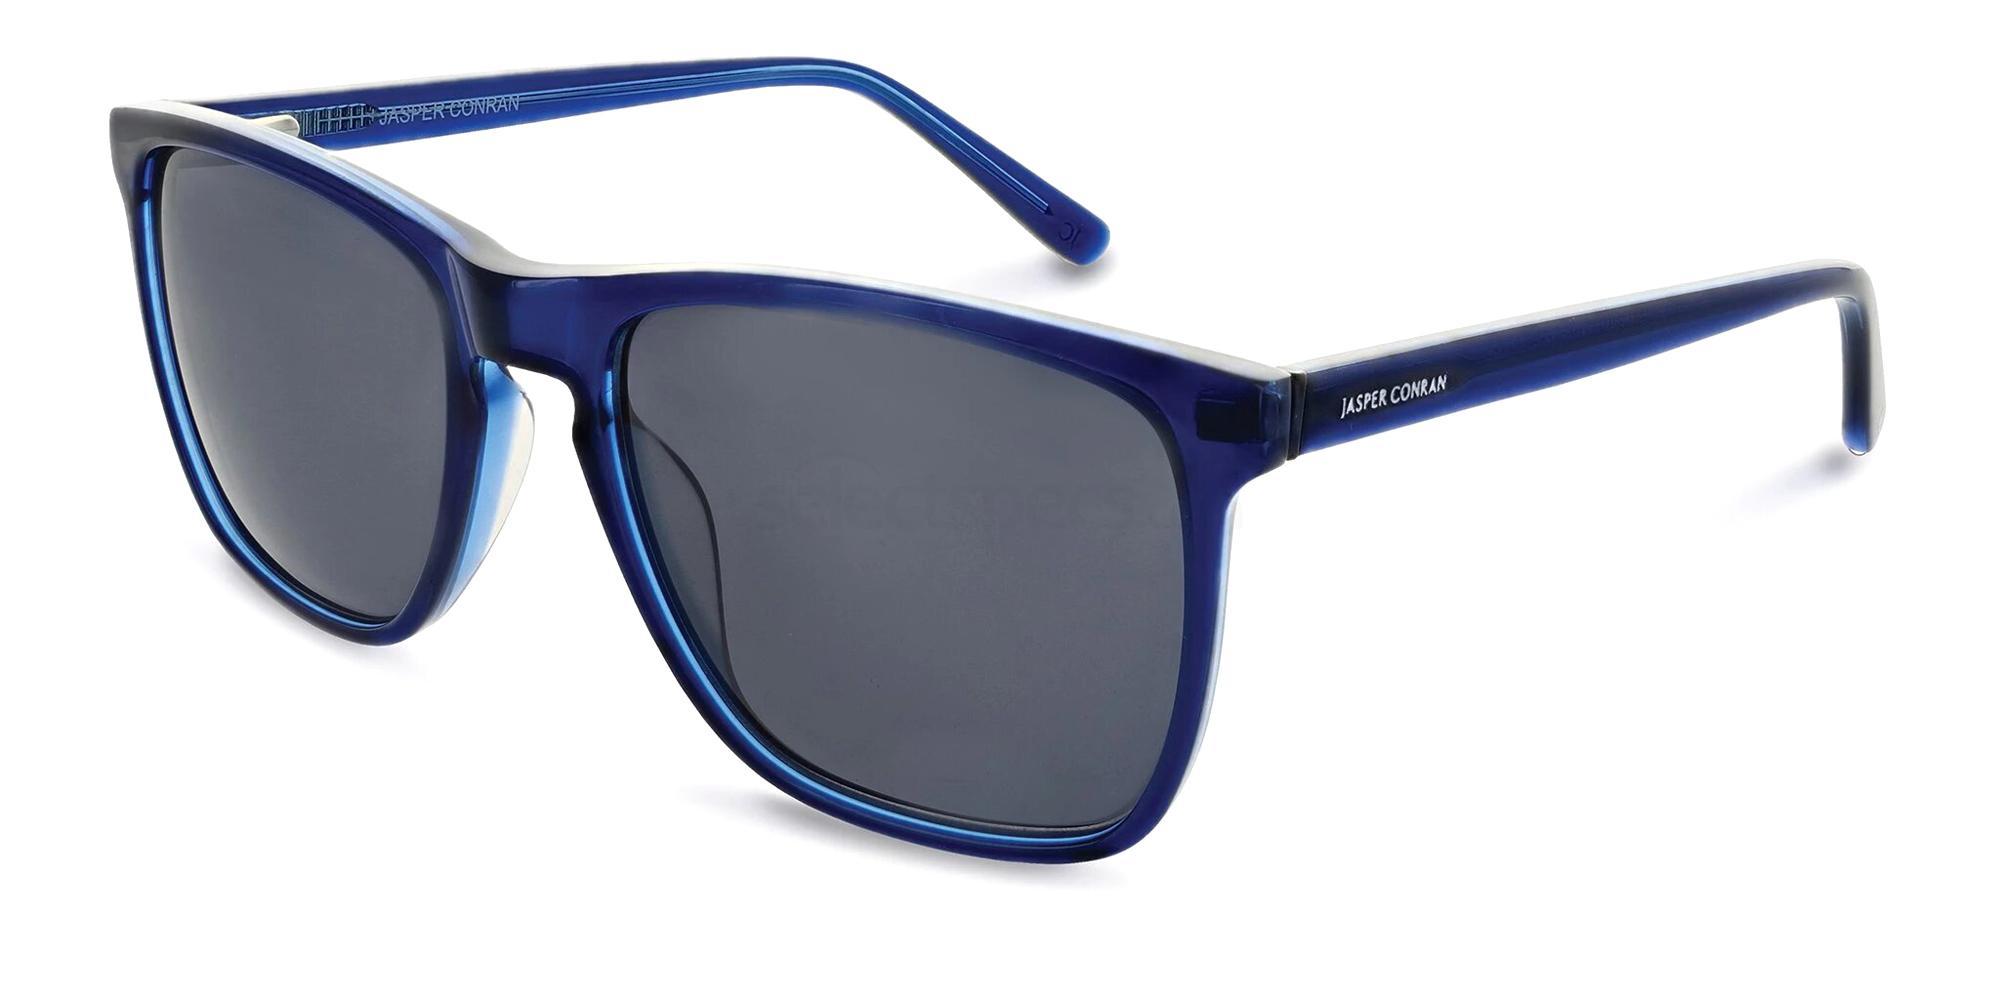 C2 JCMSUN14 Sunglasses, Jasper Conran